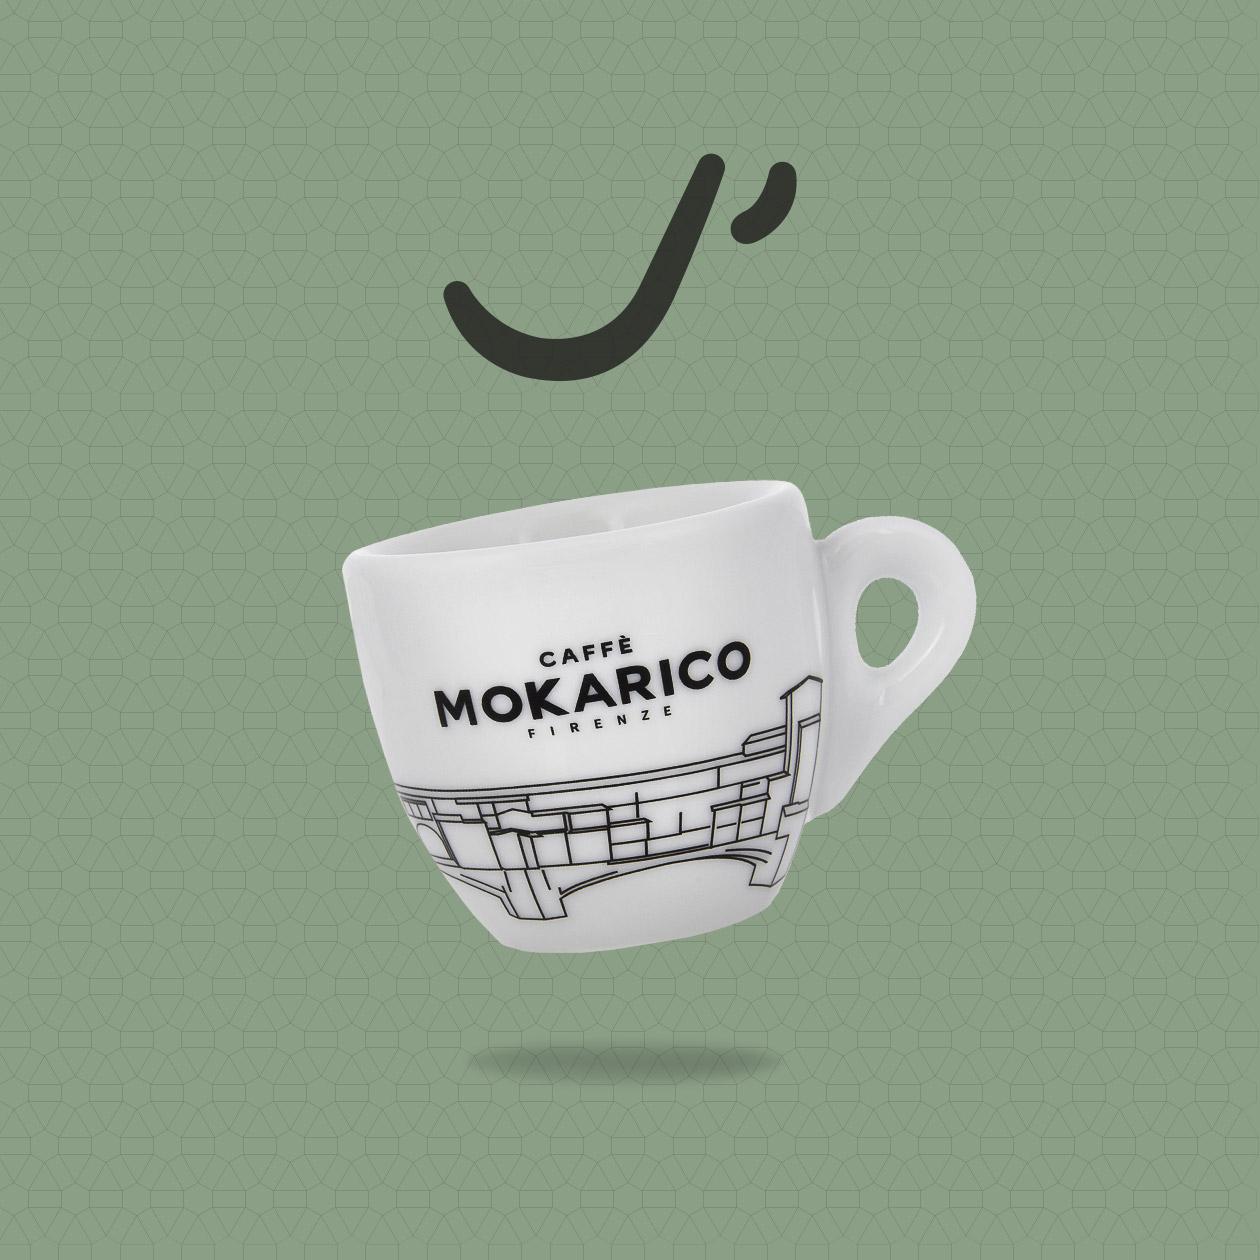 Mokarico cup